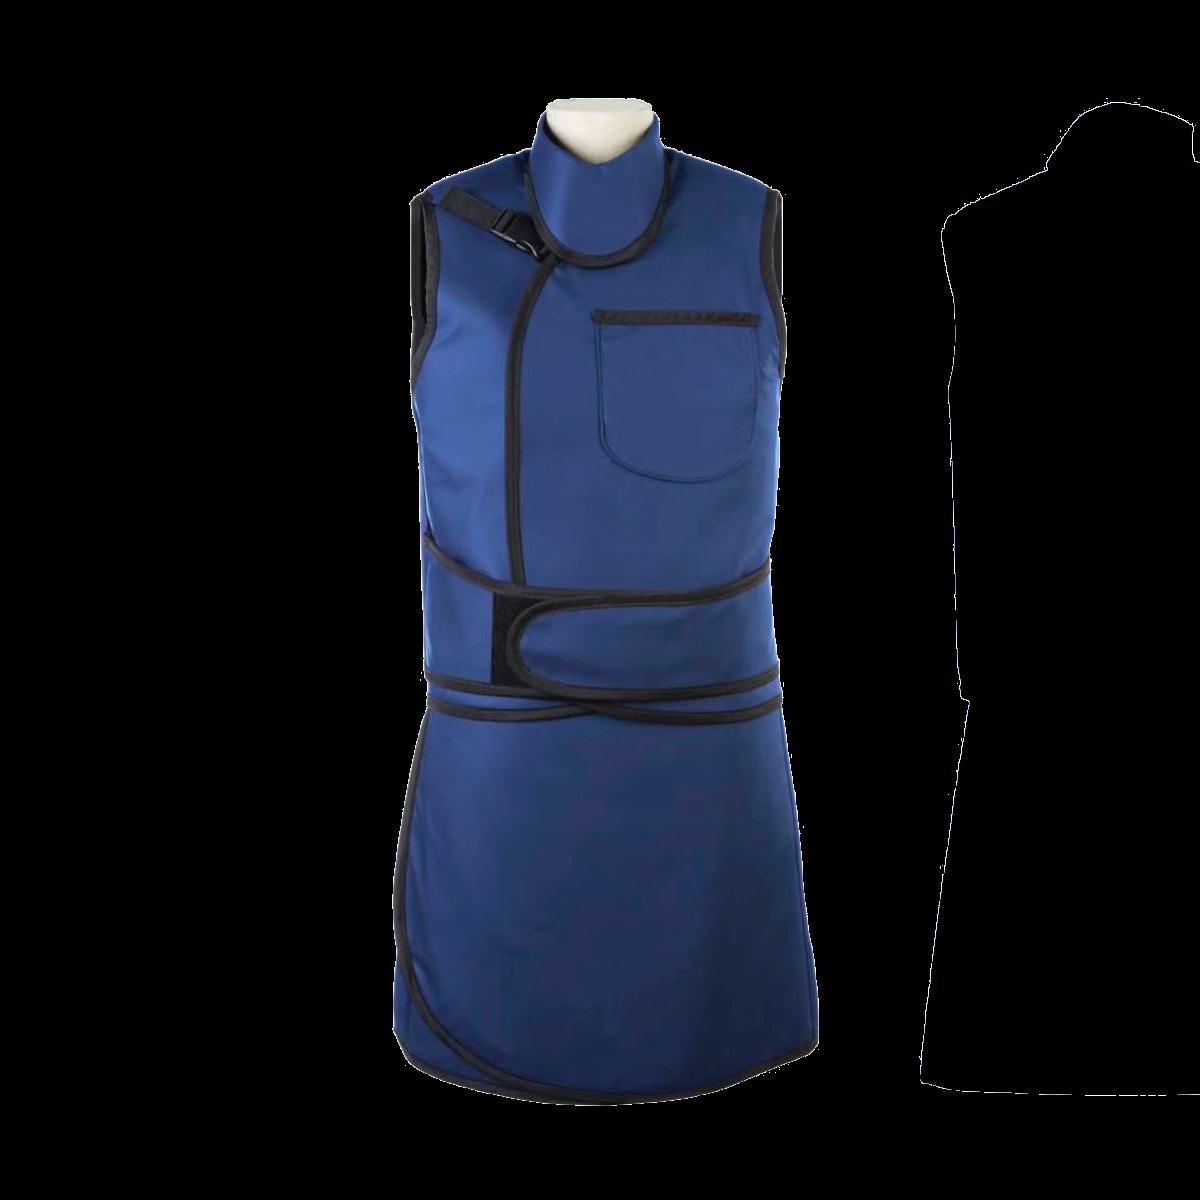 X Ray Protective Clothing